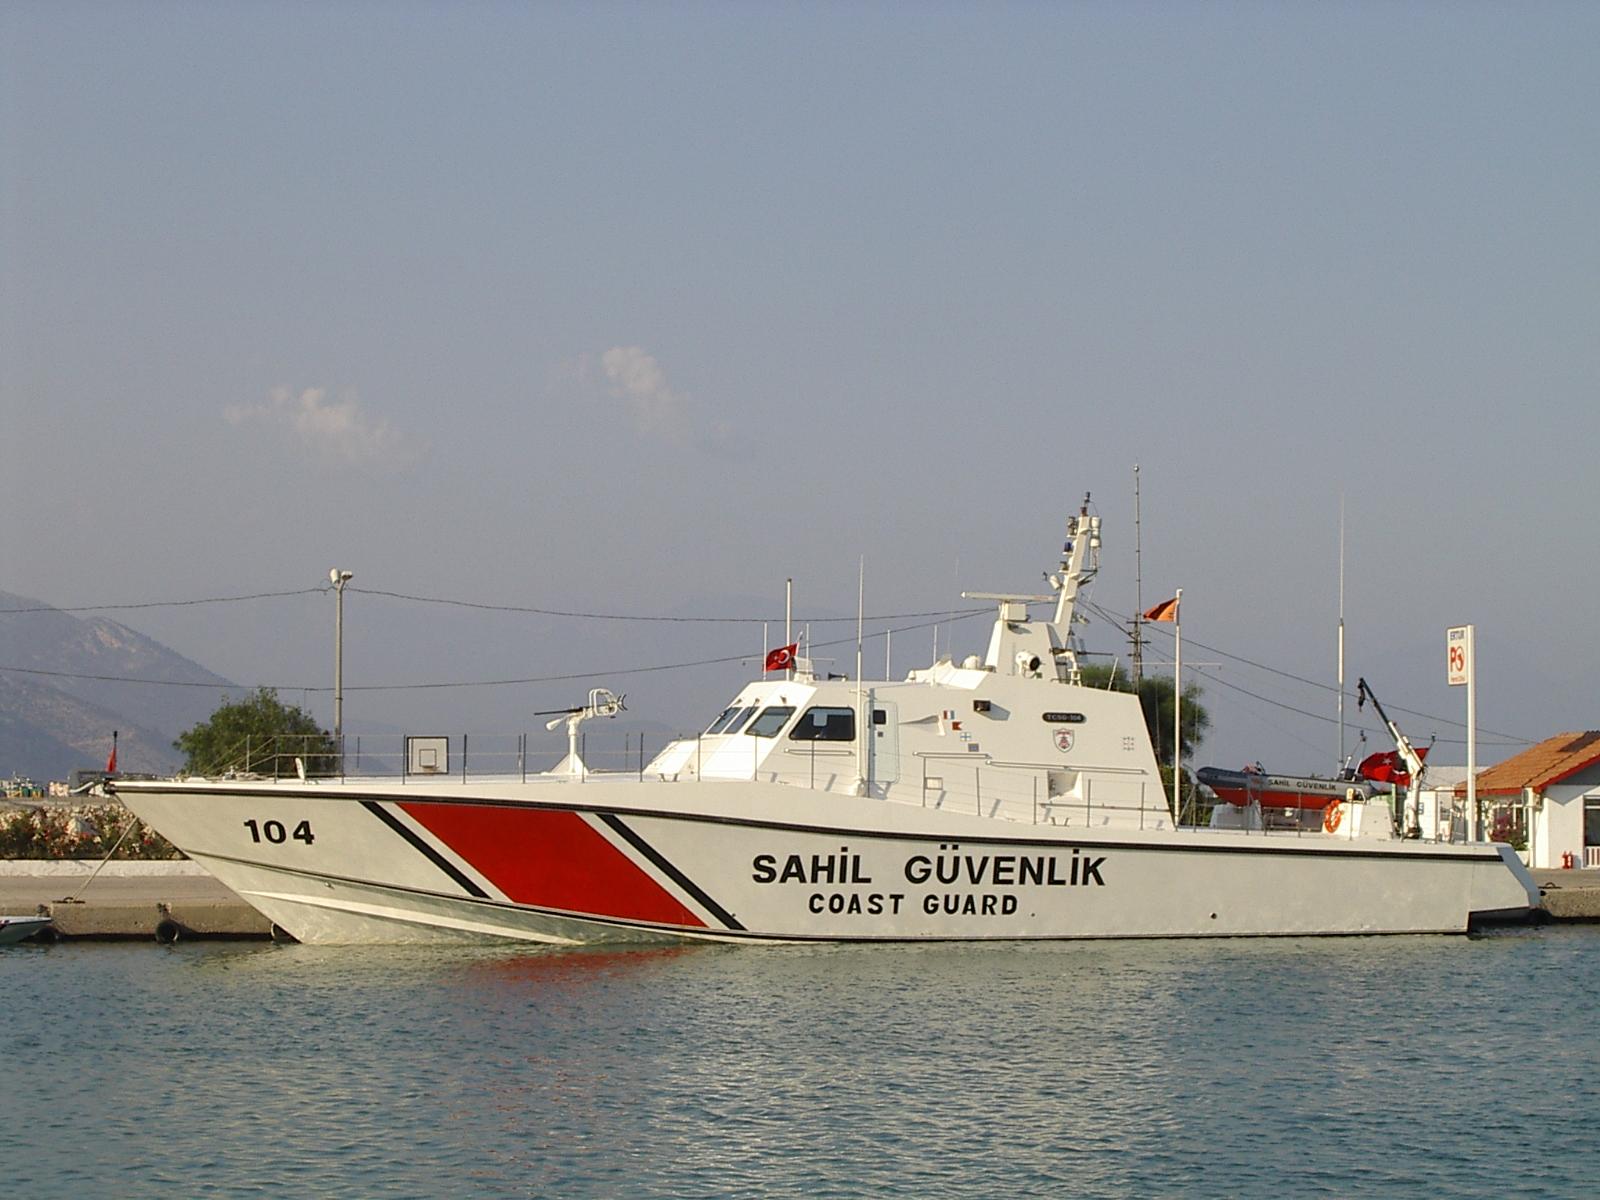 j_d coast gurad turkey turkish boat speed white red